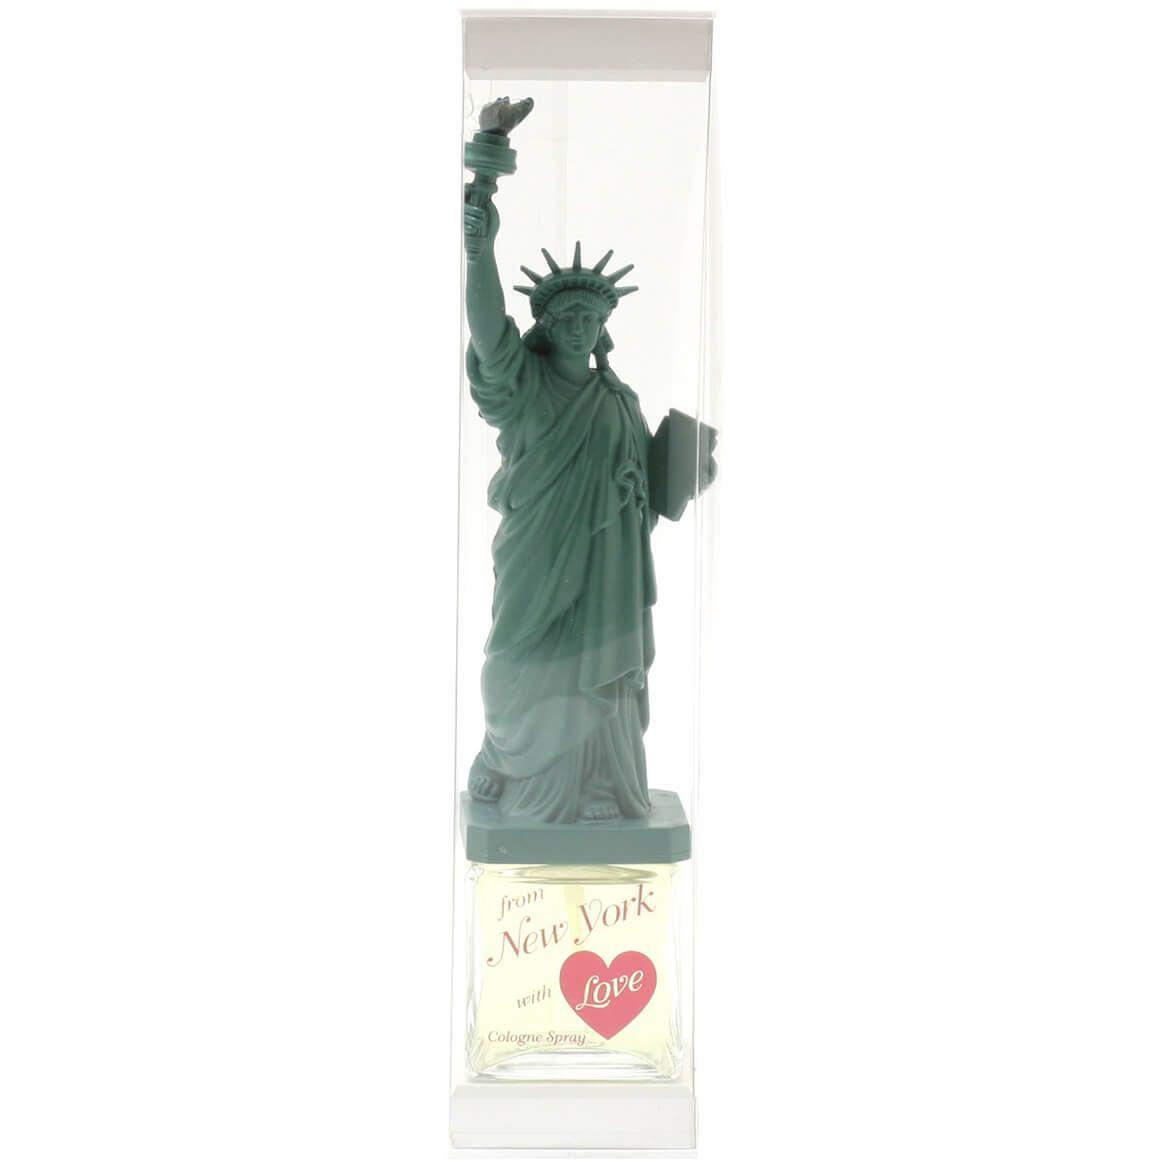 Statue of Liberty Ladies, Cologne Spray 1.7oz-360275